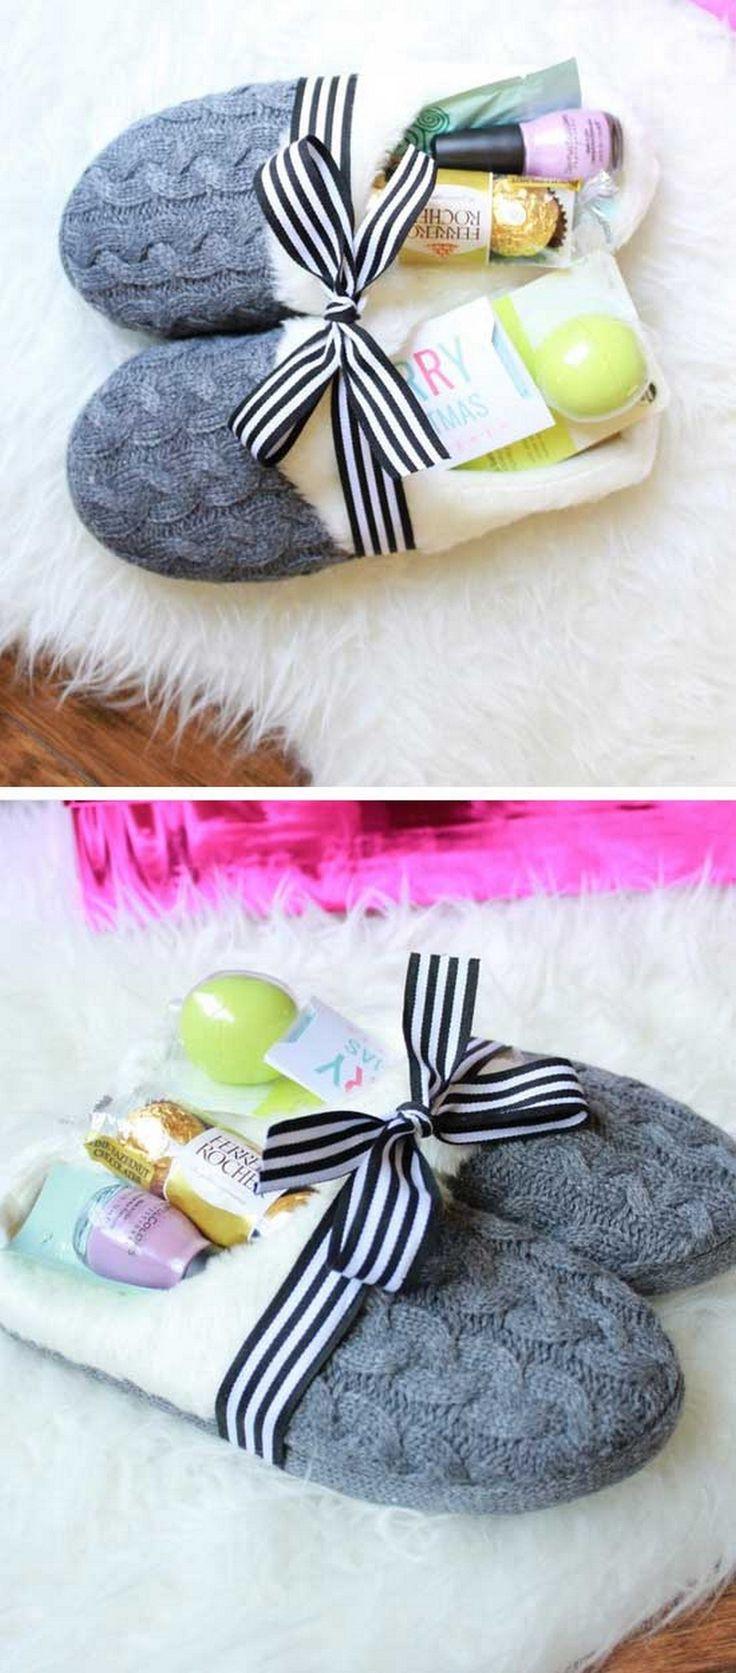 Best ideas about DIY Christmas Present Ideas . Save or Pin Best 25 Diy best friend ts ideas on Pinterest Now.